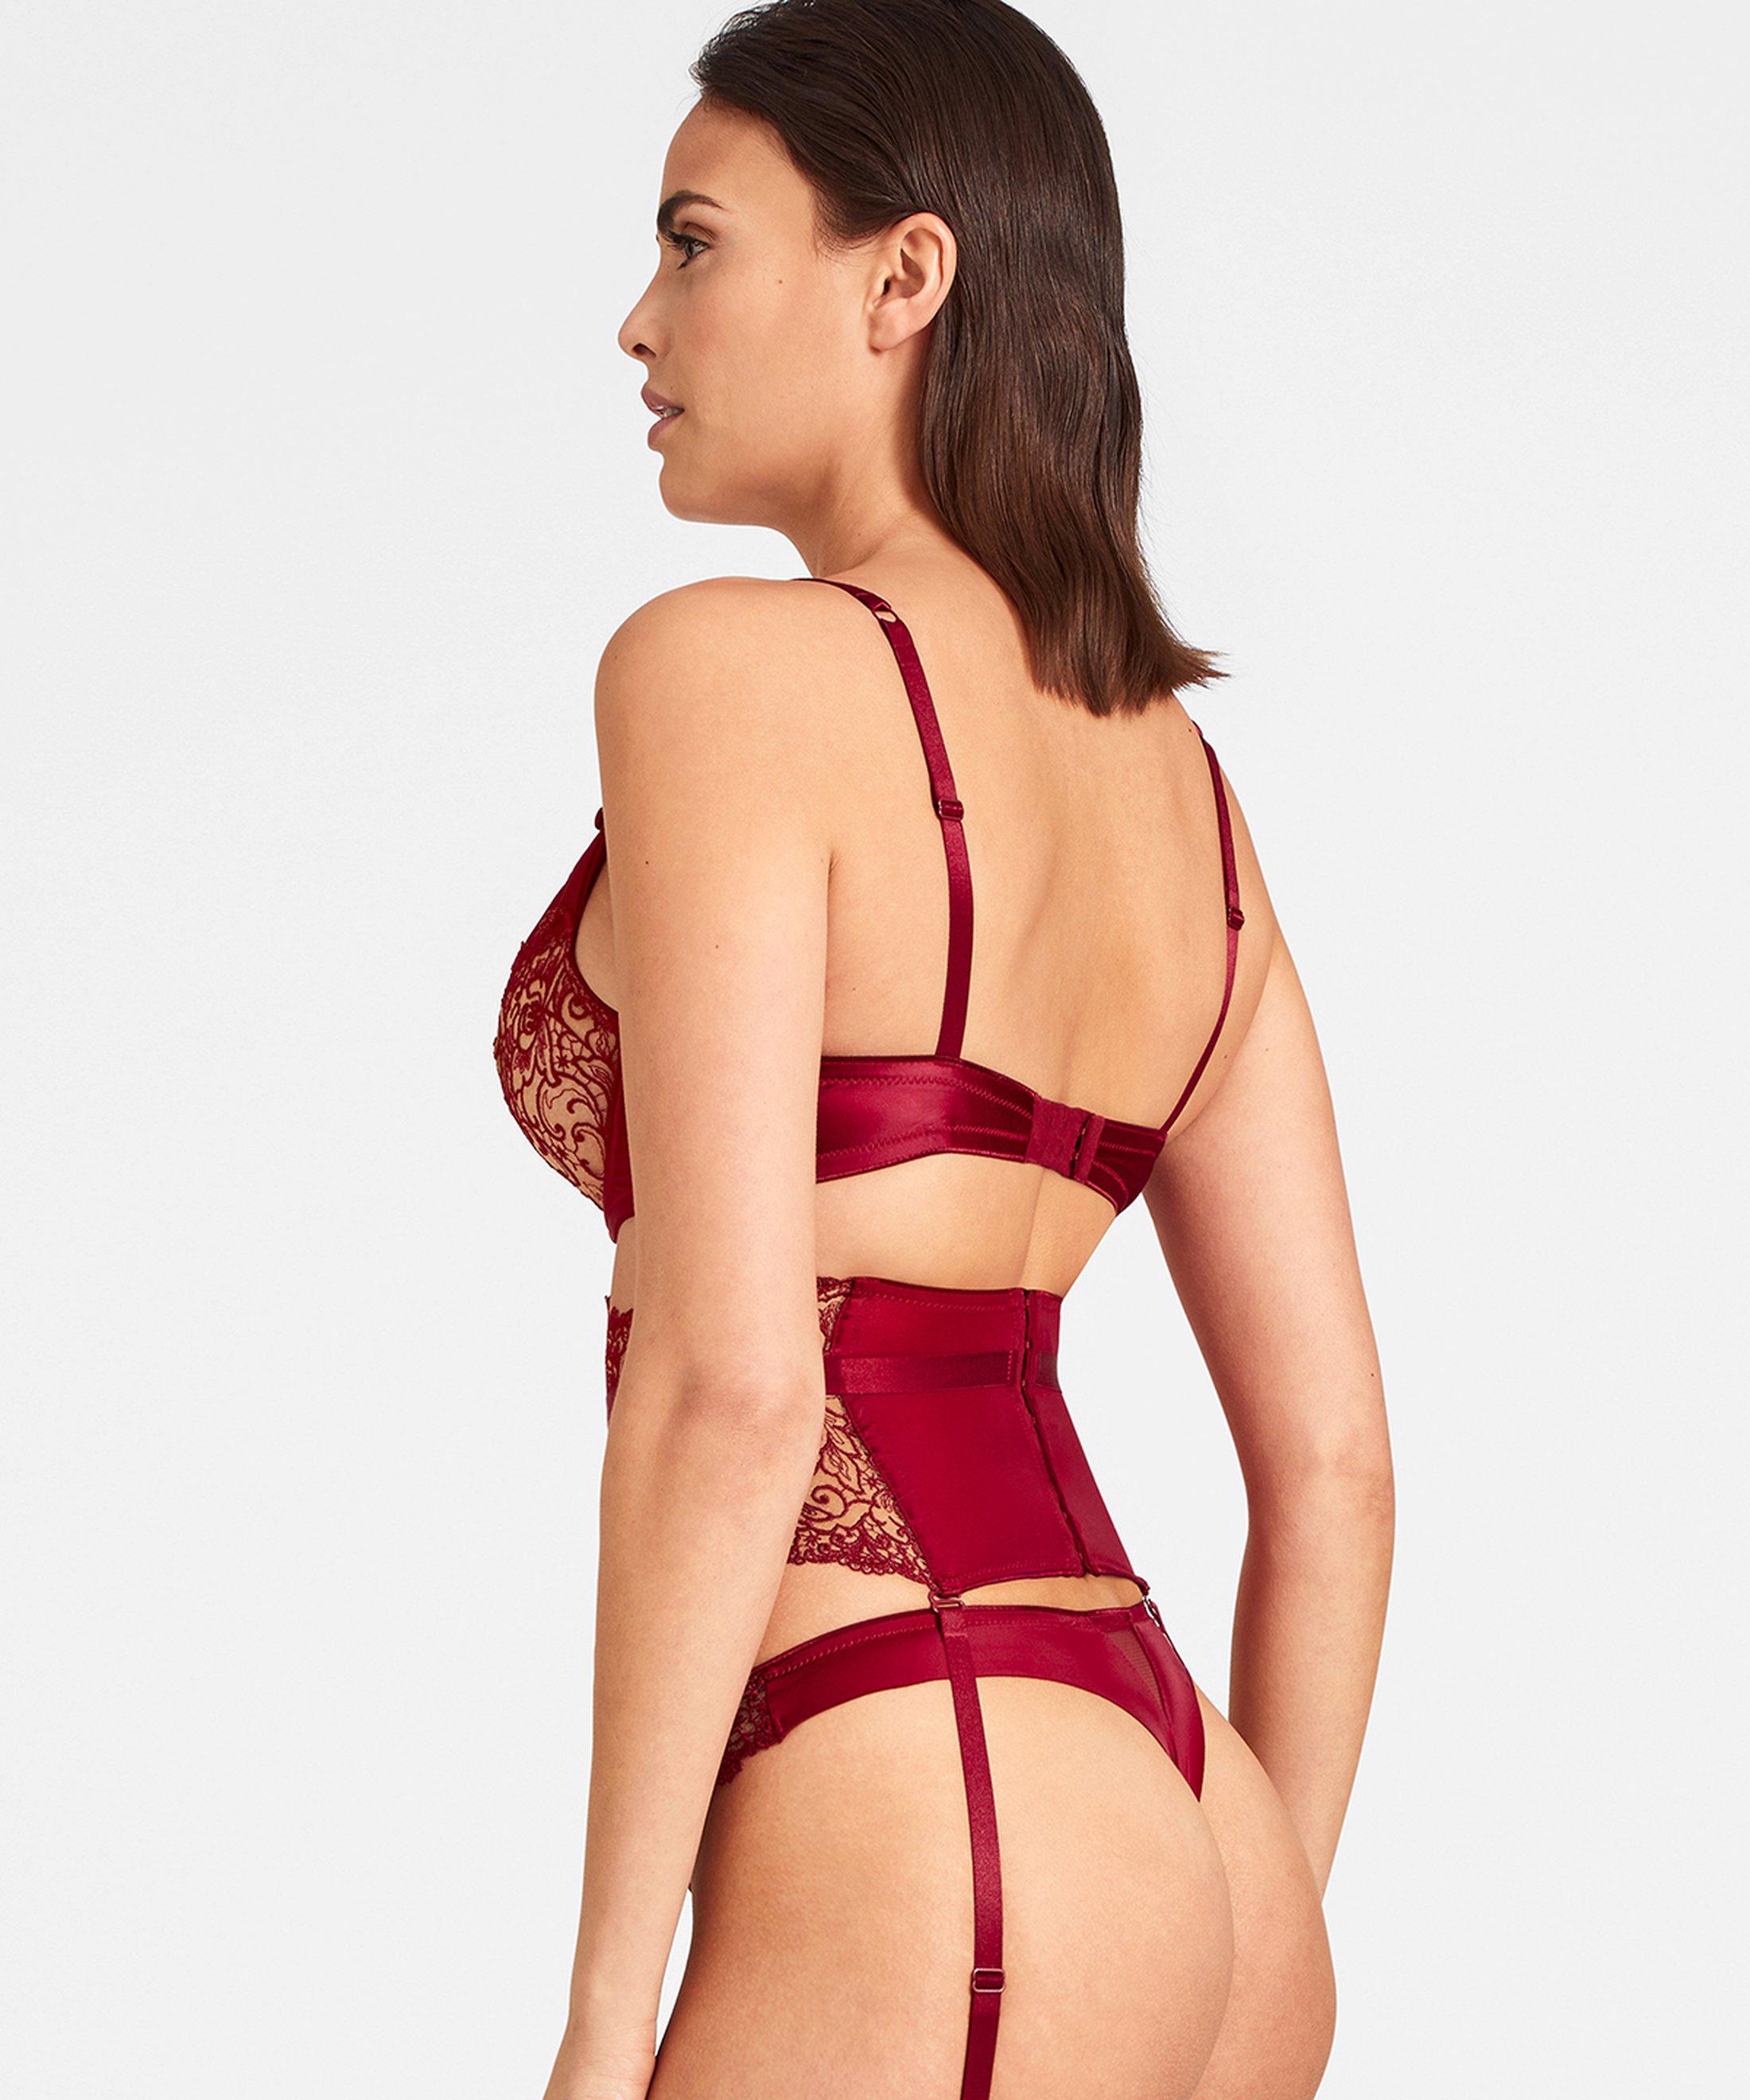 KARL LAGERFELD X AUBADE Serre-taille Rouge Rubis  | Aubade